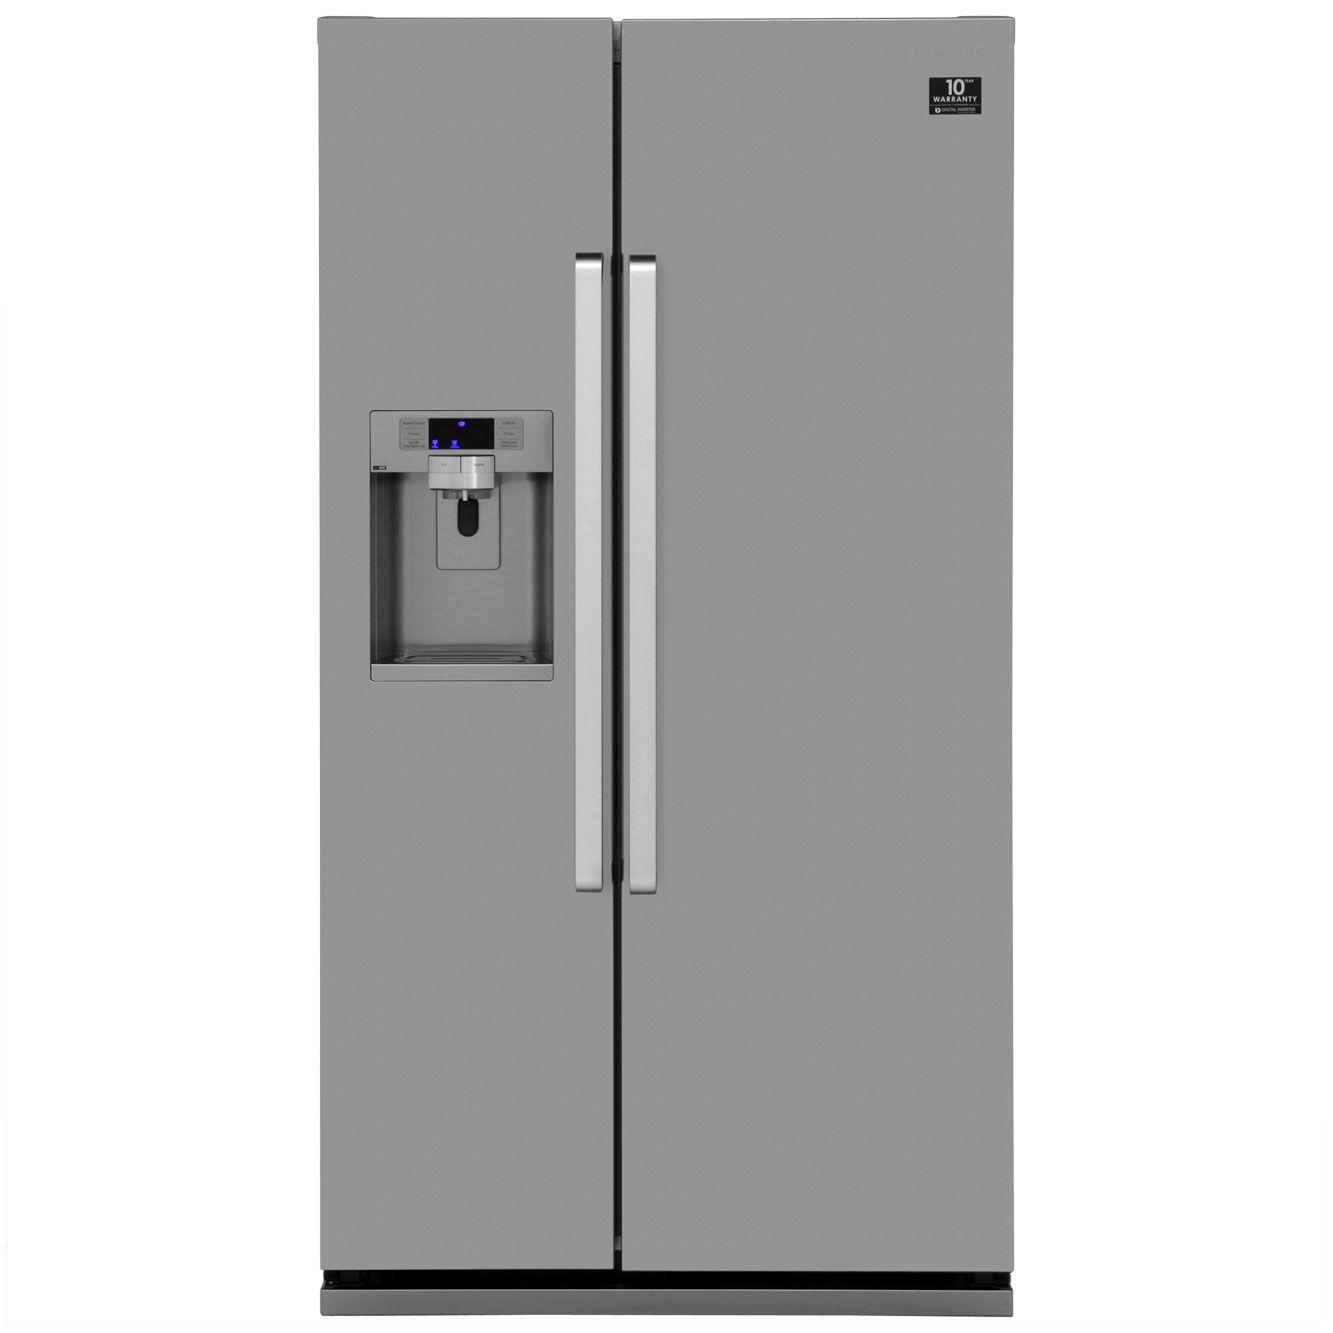 e5a7288e85a3 Samsung G-Series RSG5UCRS Freestanding American Fridge Freezer - Stainless  Steel